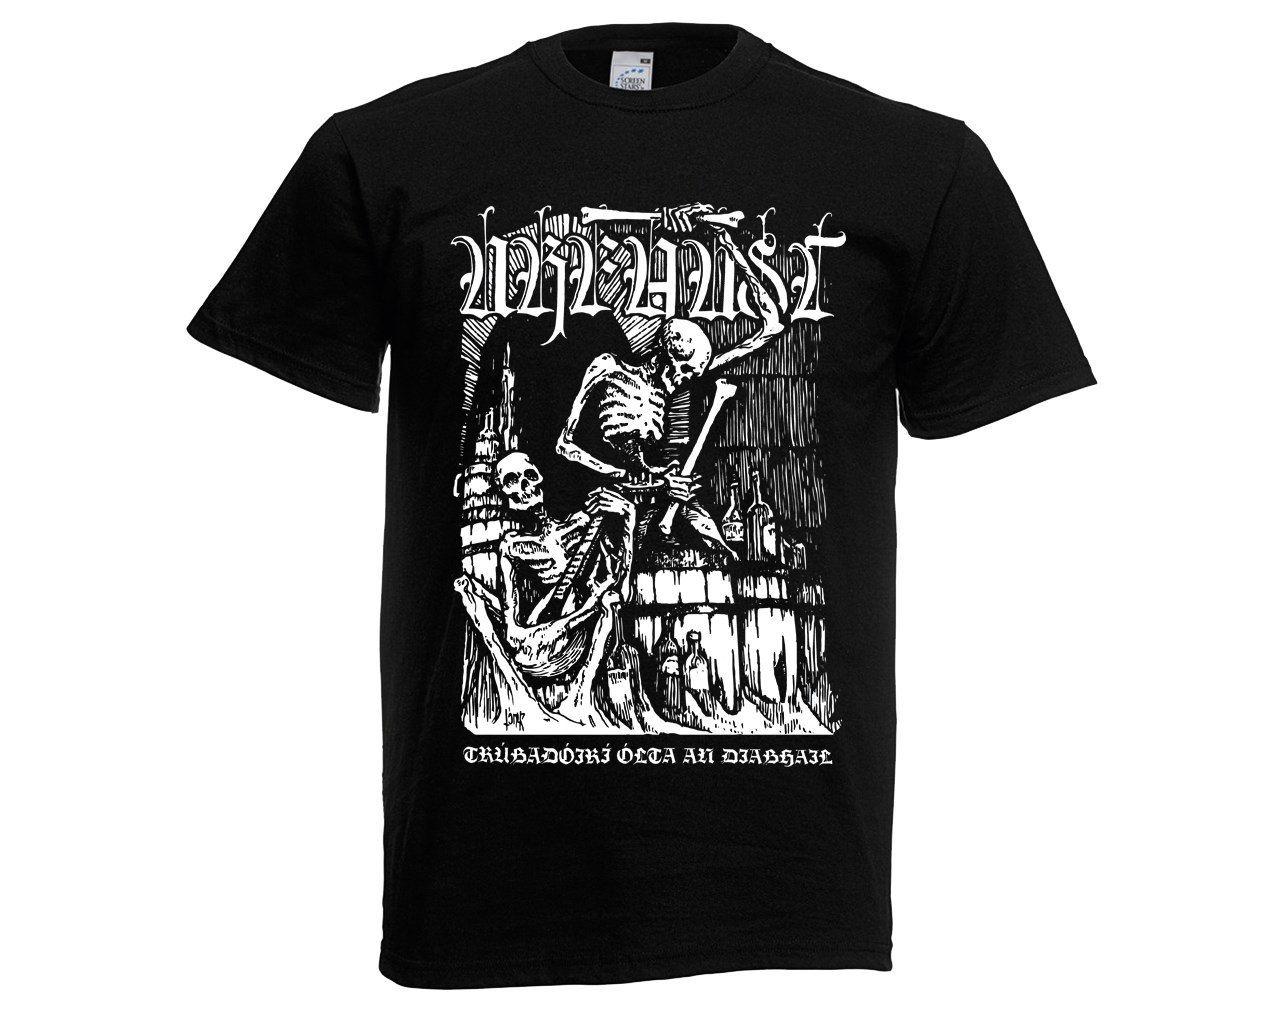 Urfaust t-shirt New! T-Shirt Novelty Cool Tops MenS Short Sleeve T shirt 100% Cotton Letter Printed TShirts top tee